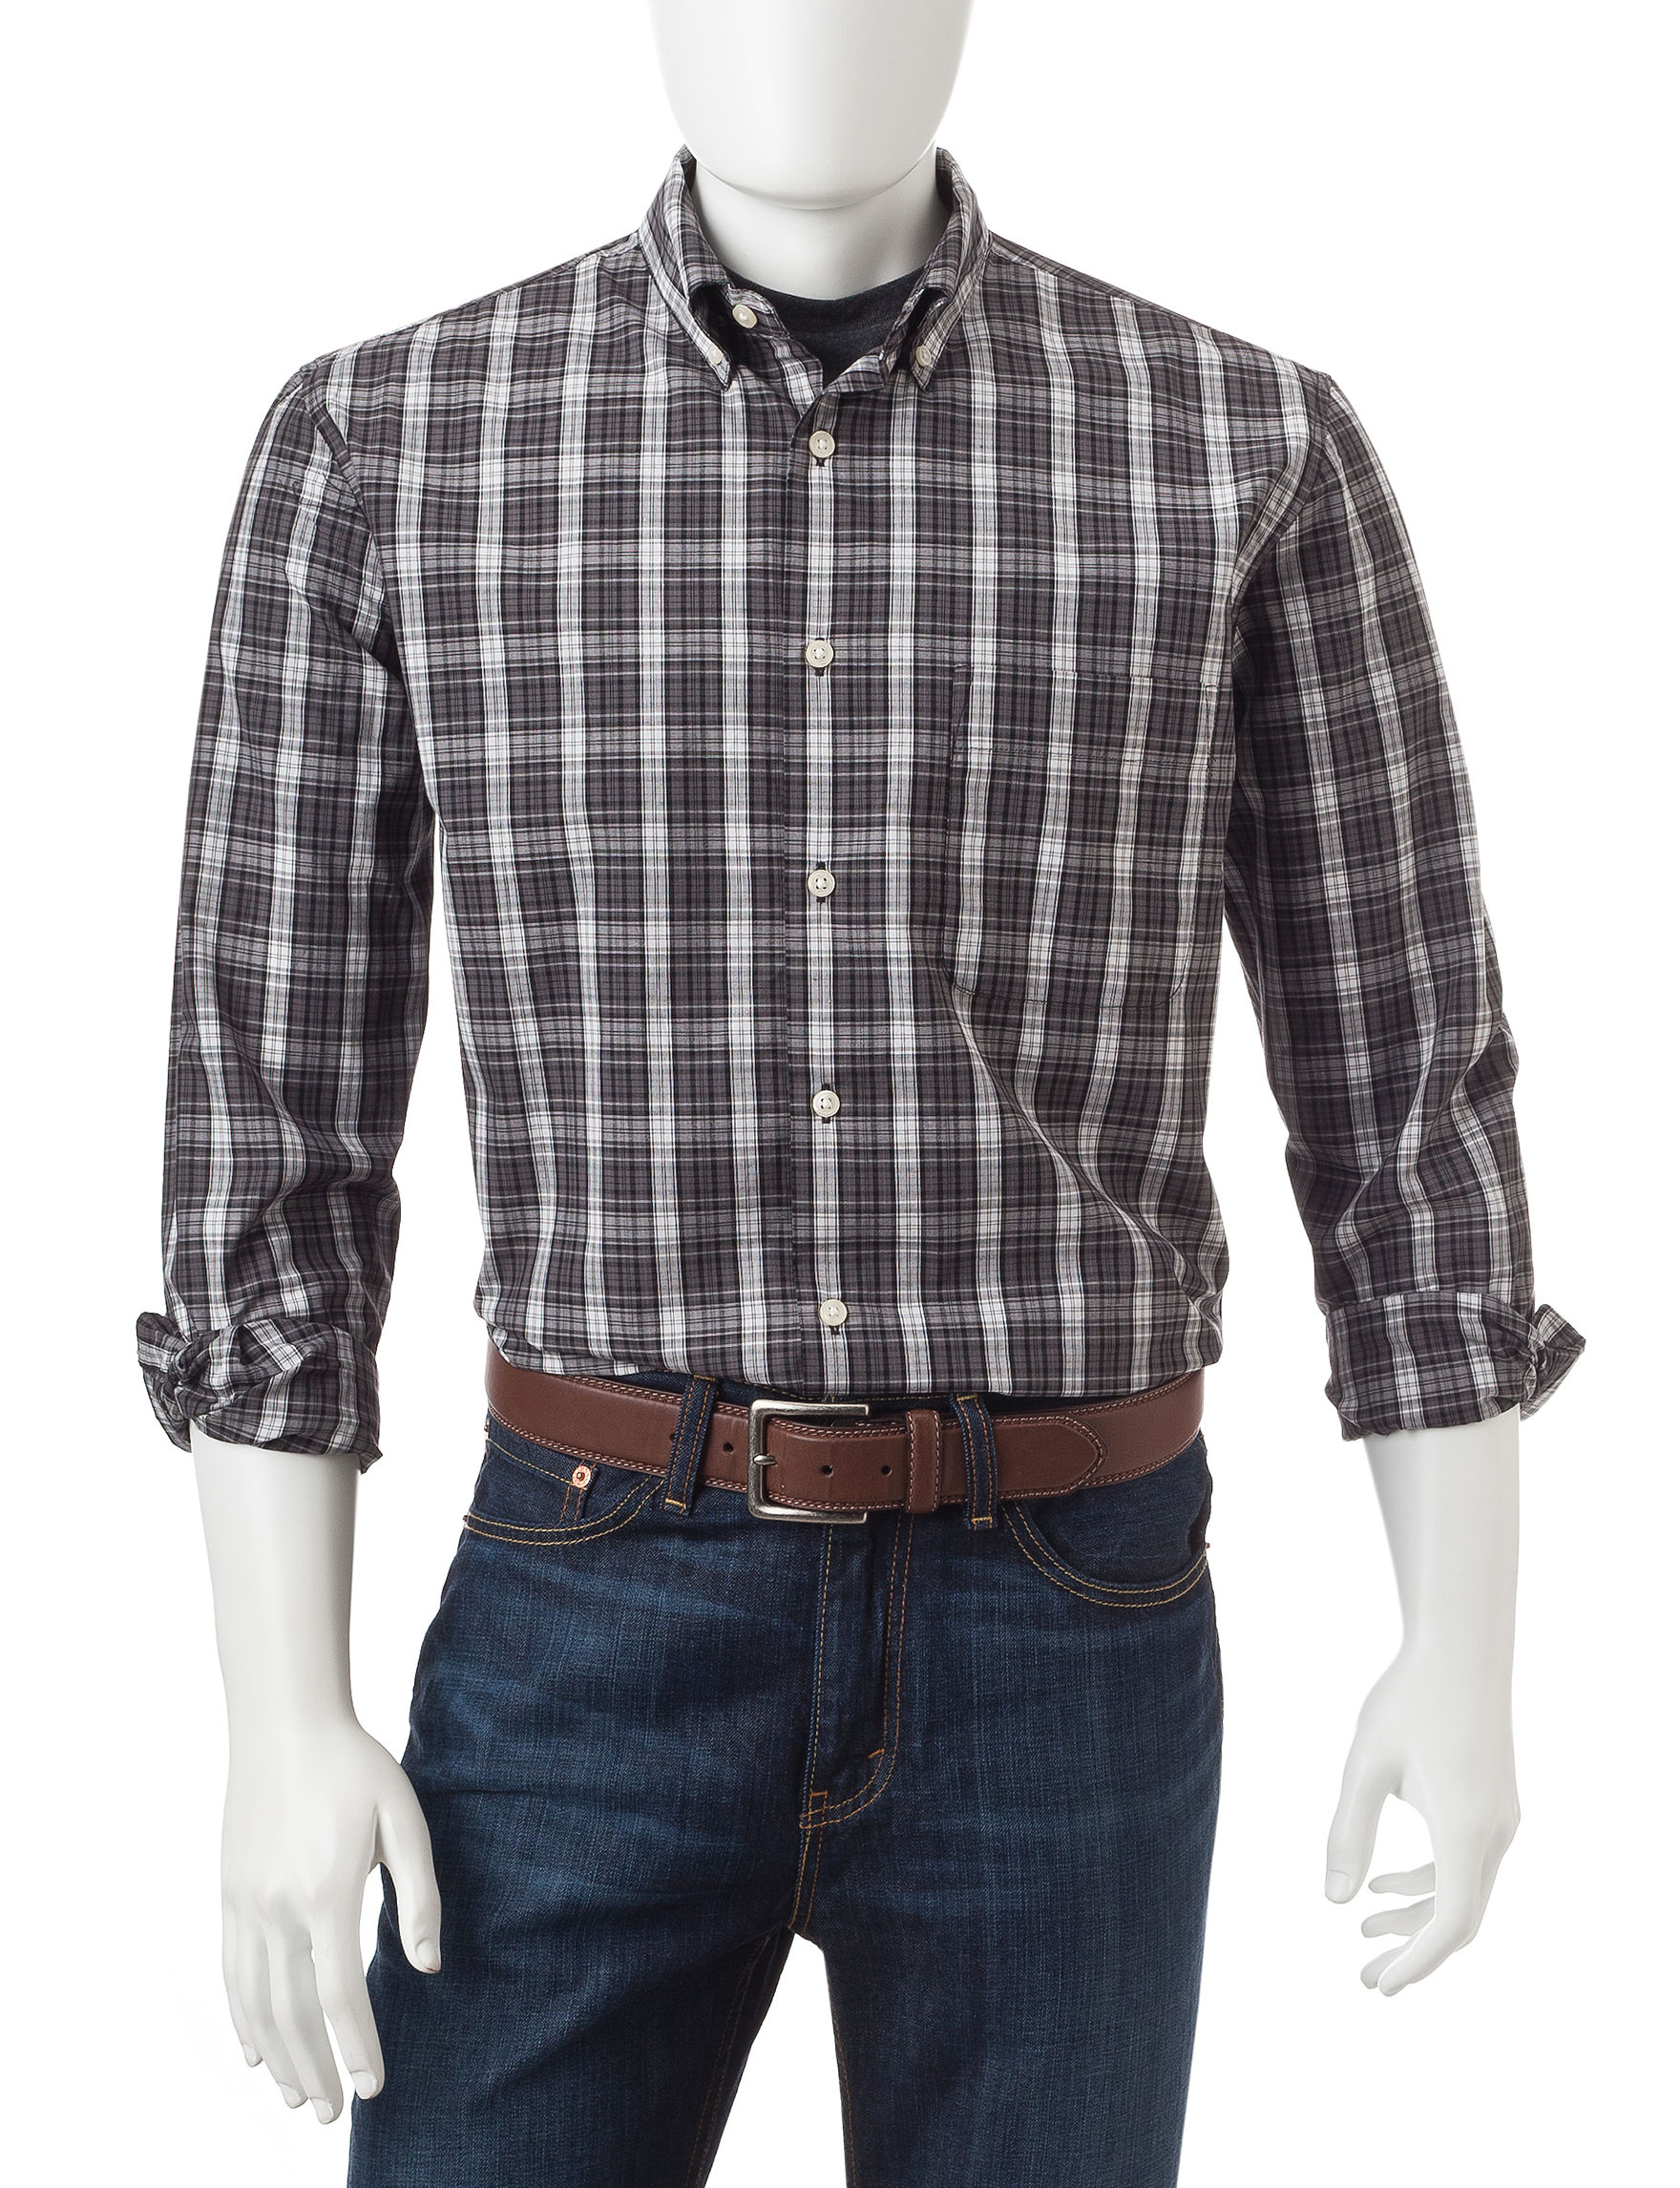 Sun River Onyx Casual Button Down Shirts